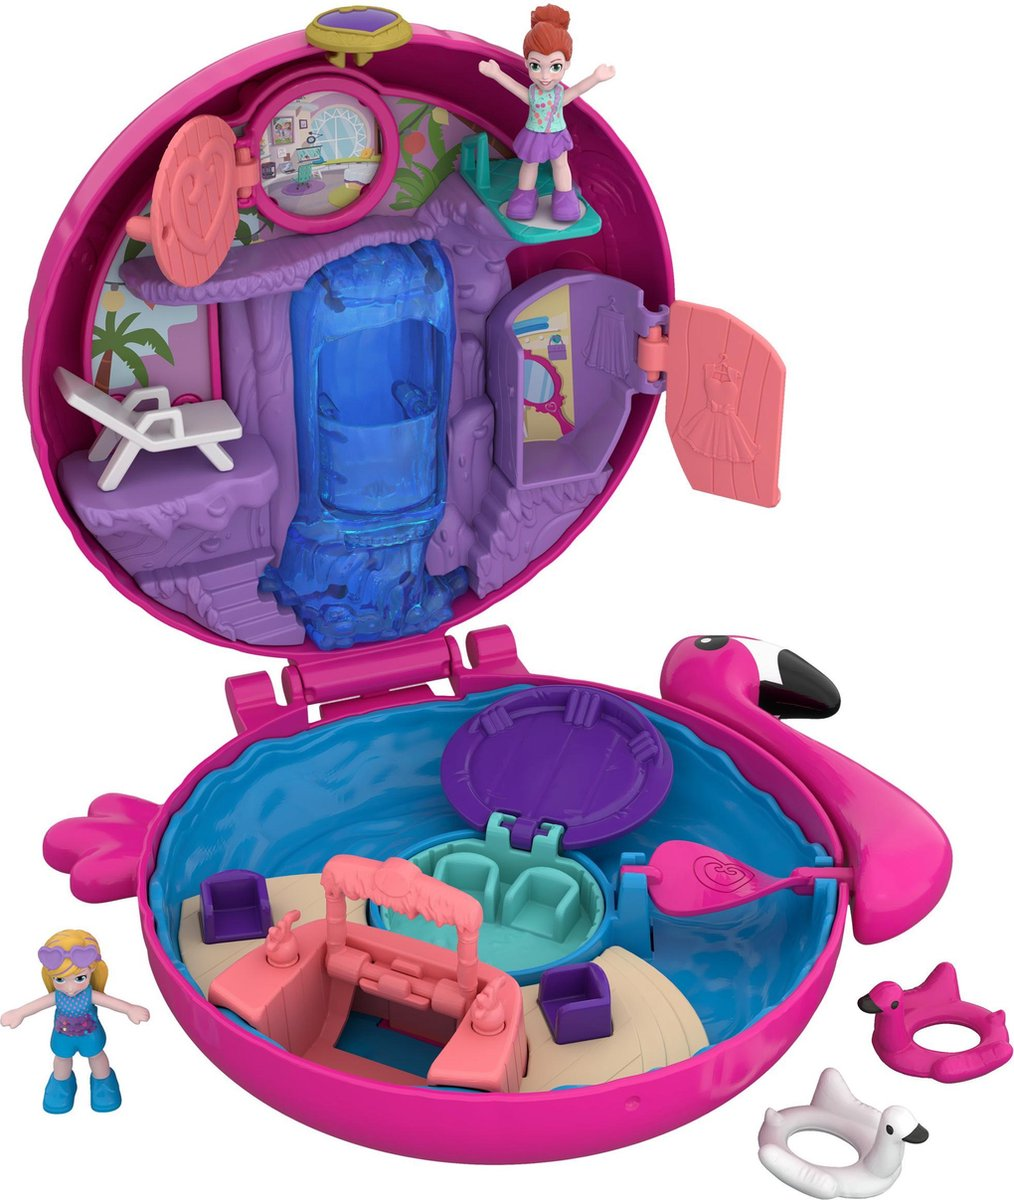 Polly Pocket Pocket World Flamingo Floatie - Speelfigurenset